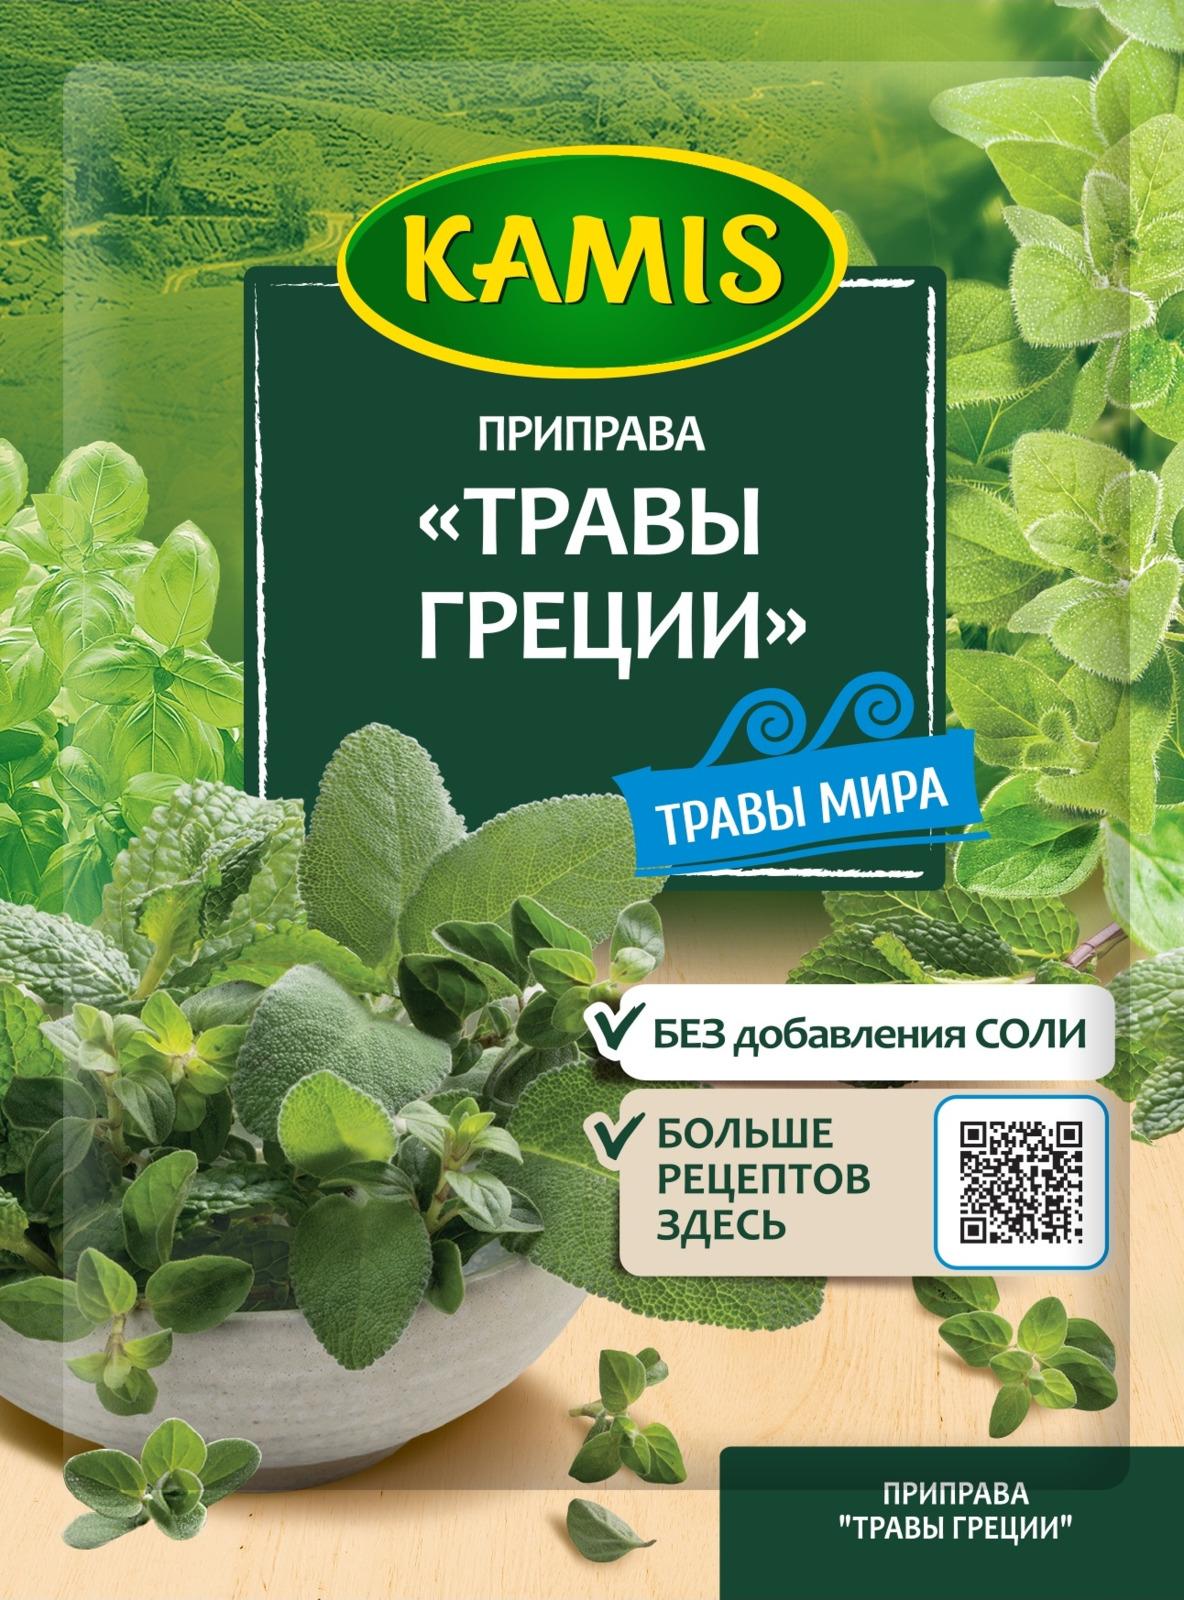 Приправа Kamis Травы Греции, 10 г